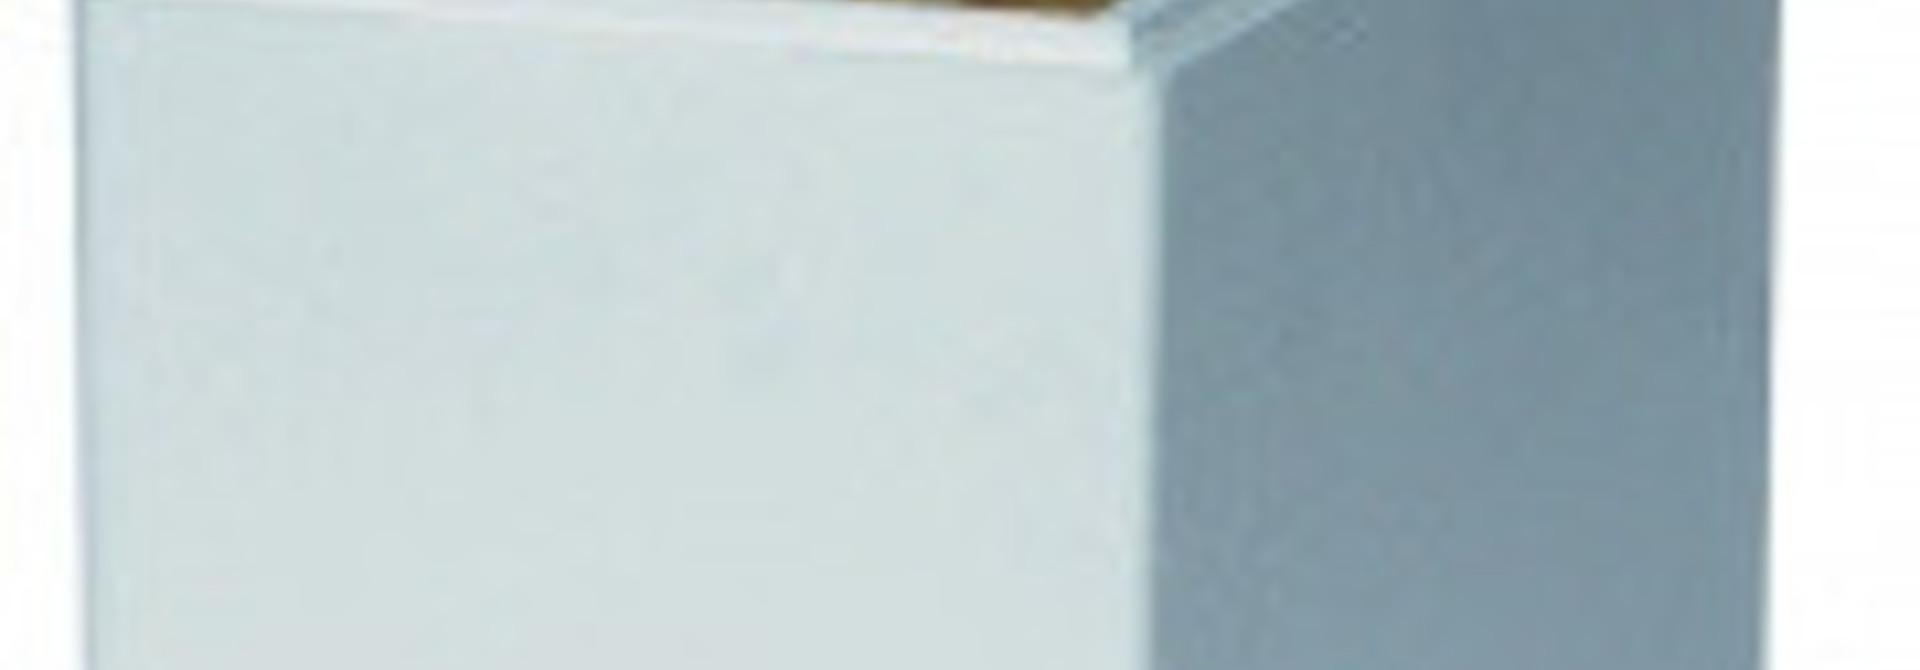 Simplex afleggerkast (styropor)